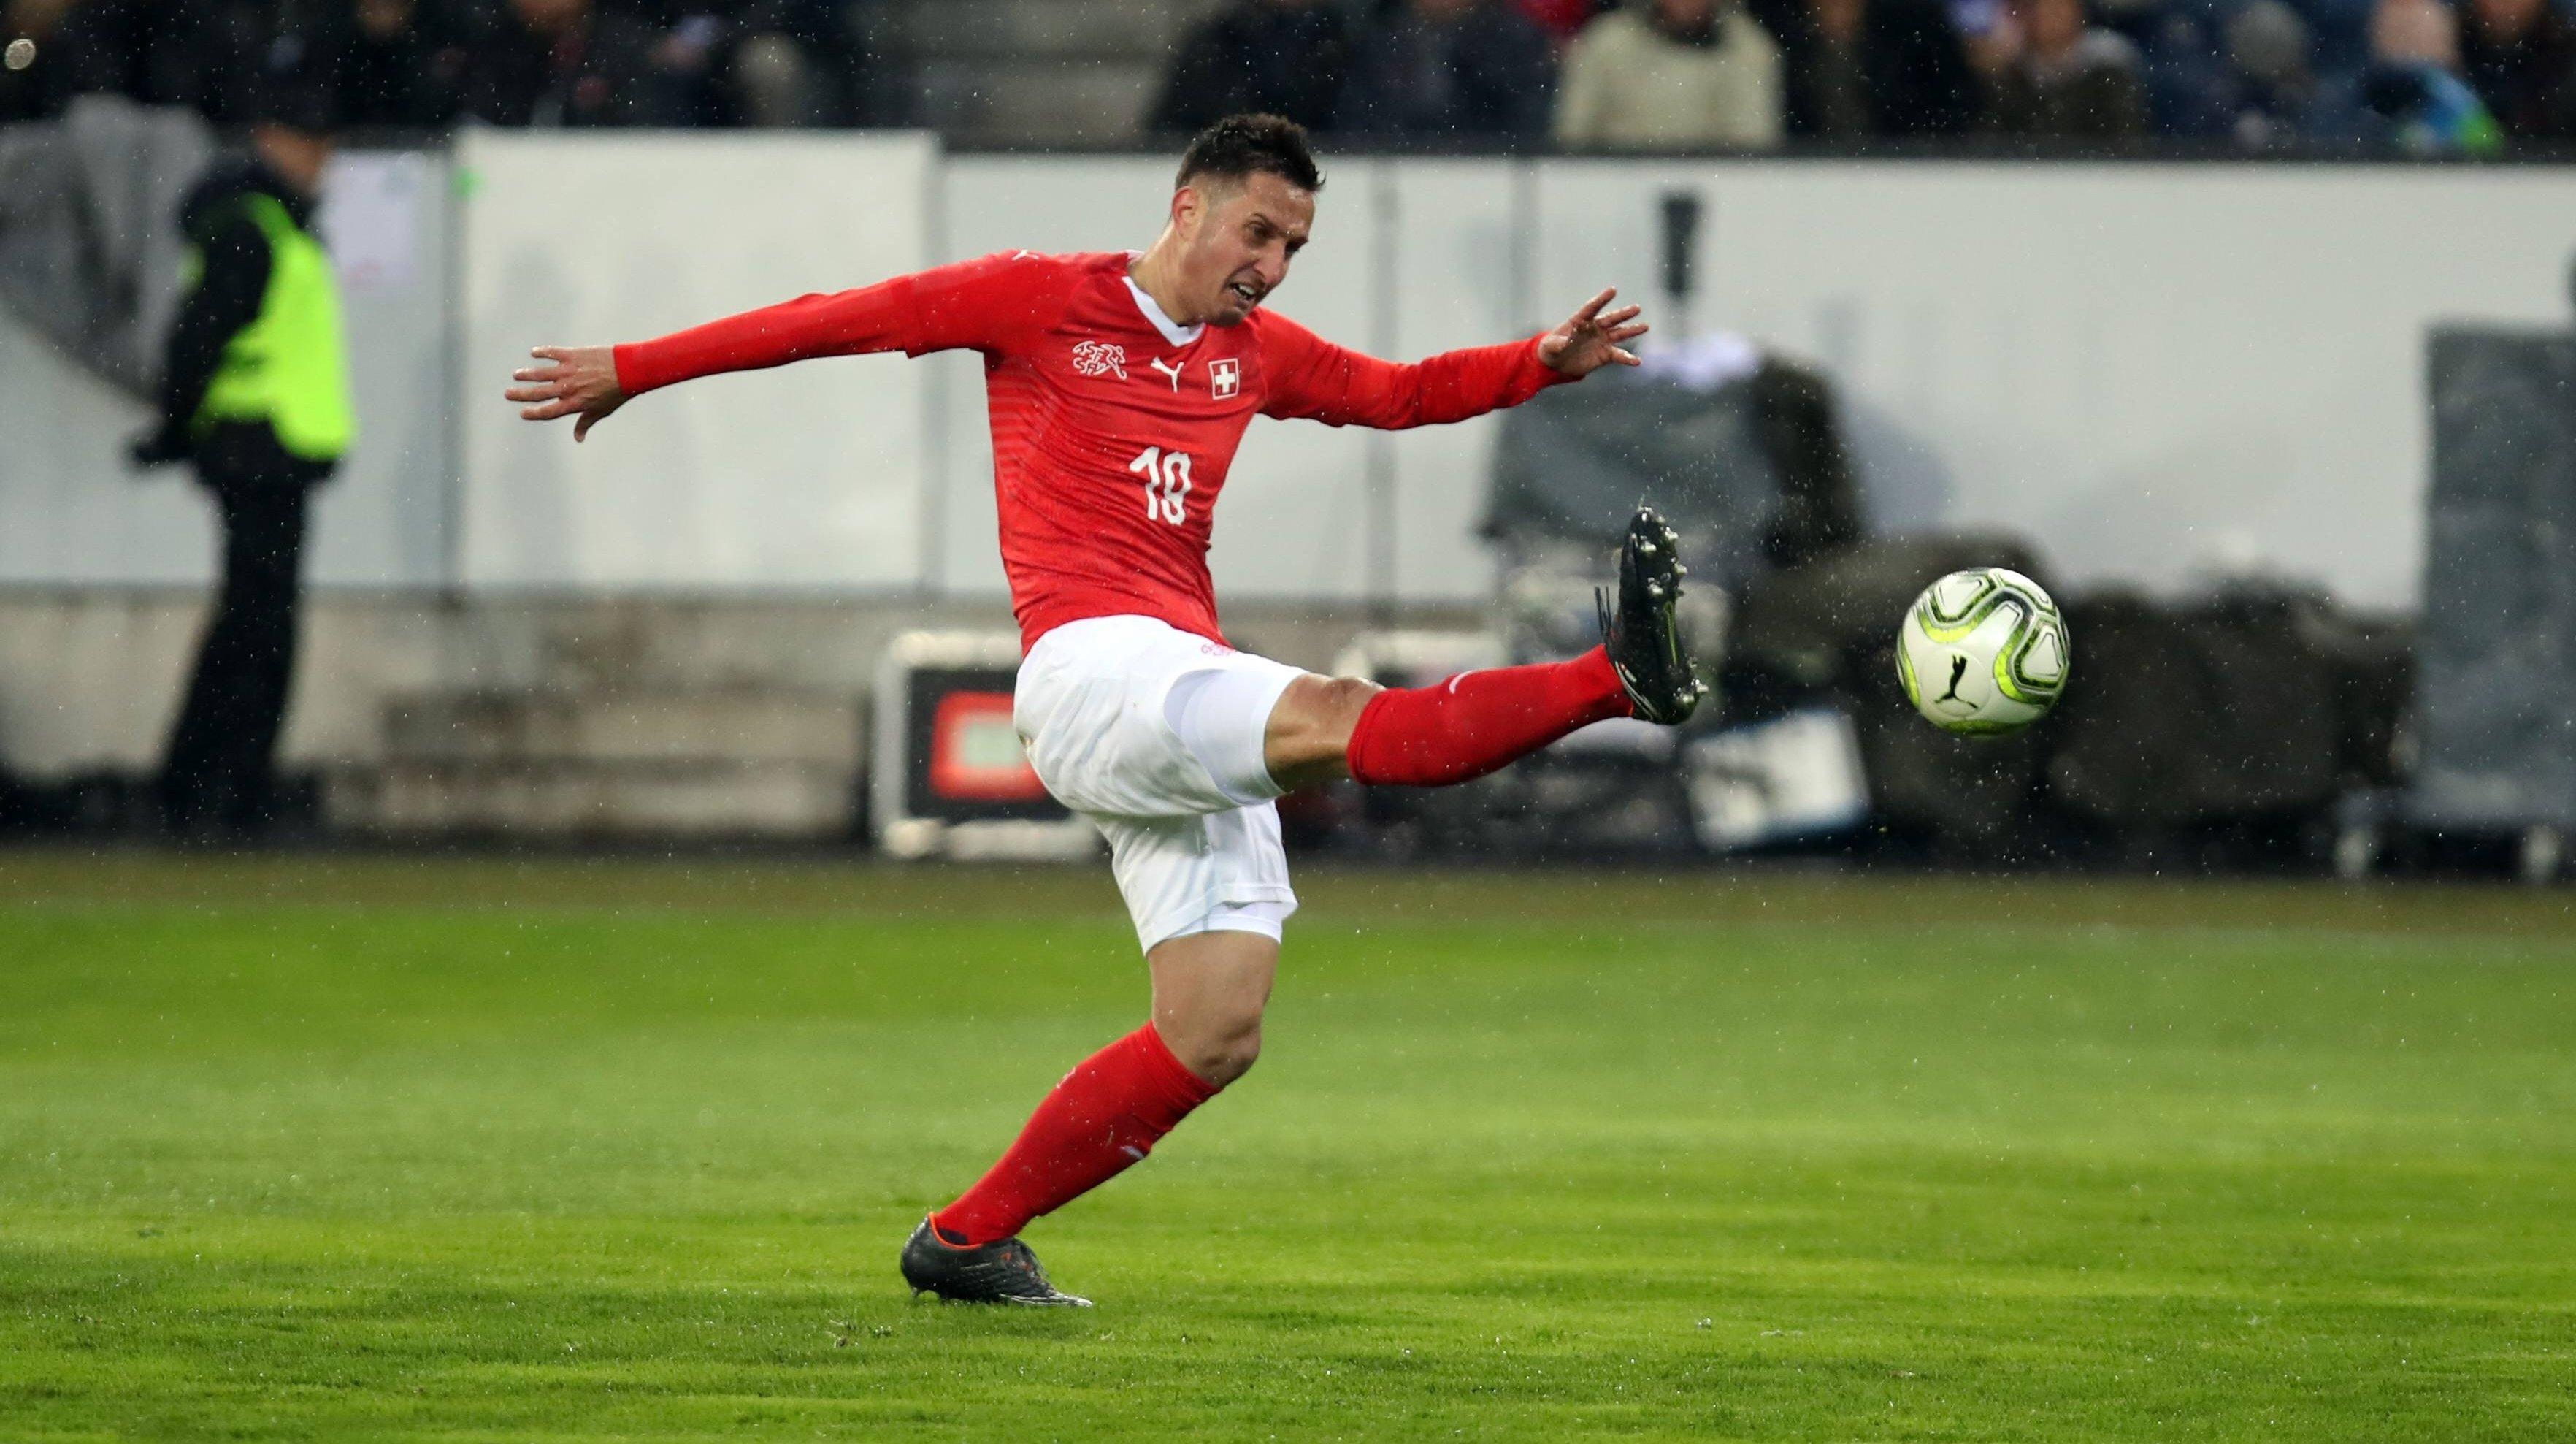 Ex-Bundesliga-Profi Mario Gavranovic wechselt zu Kayserispor in die Türkei